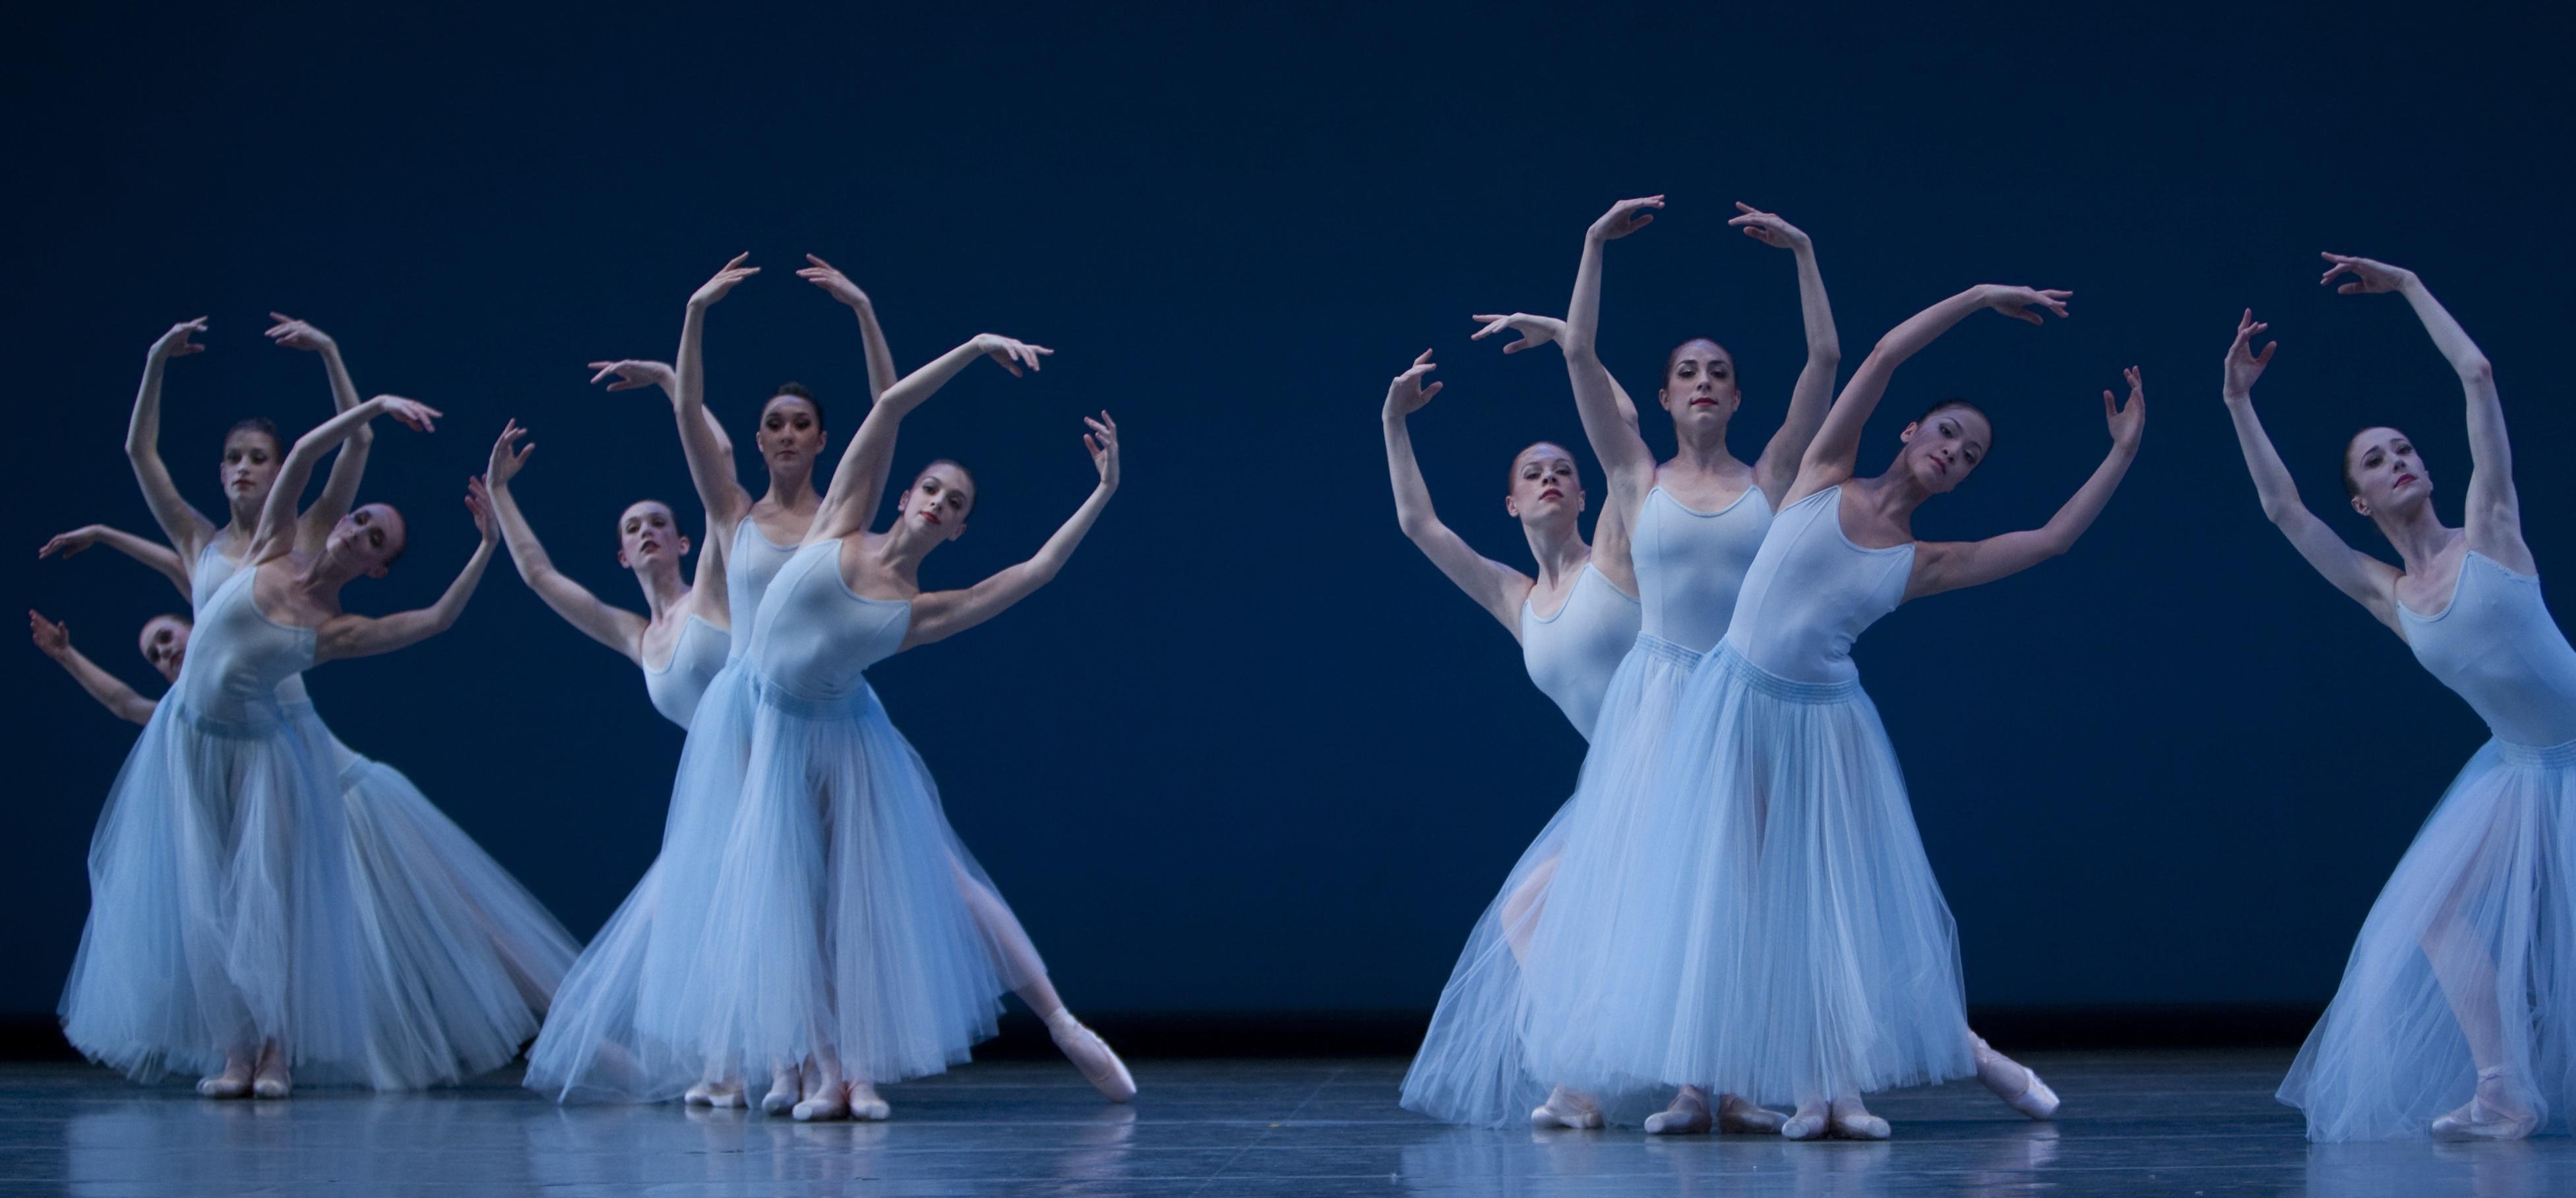 Pacific Northwest Ballet in Serenade © The Balanchine Trust, photo © Angela Sterling